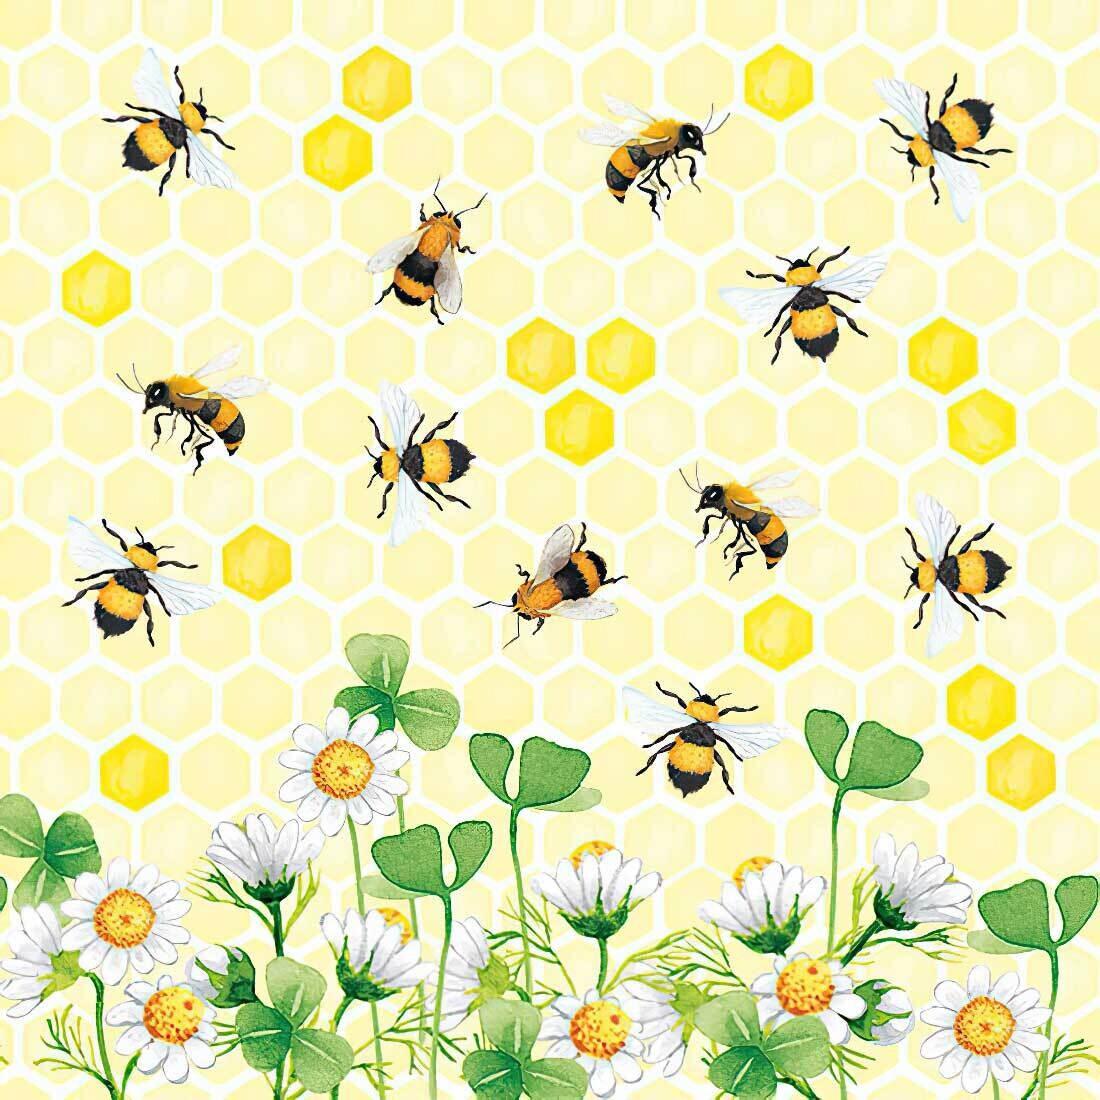 Decoupage Paper Napkins - Bees Joy (1 Sheet)